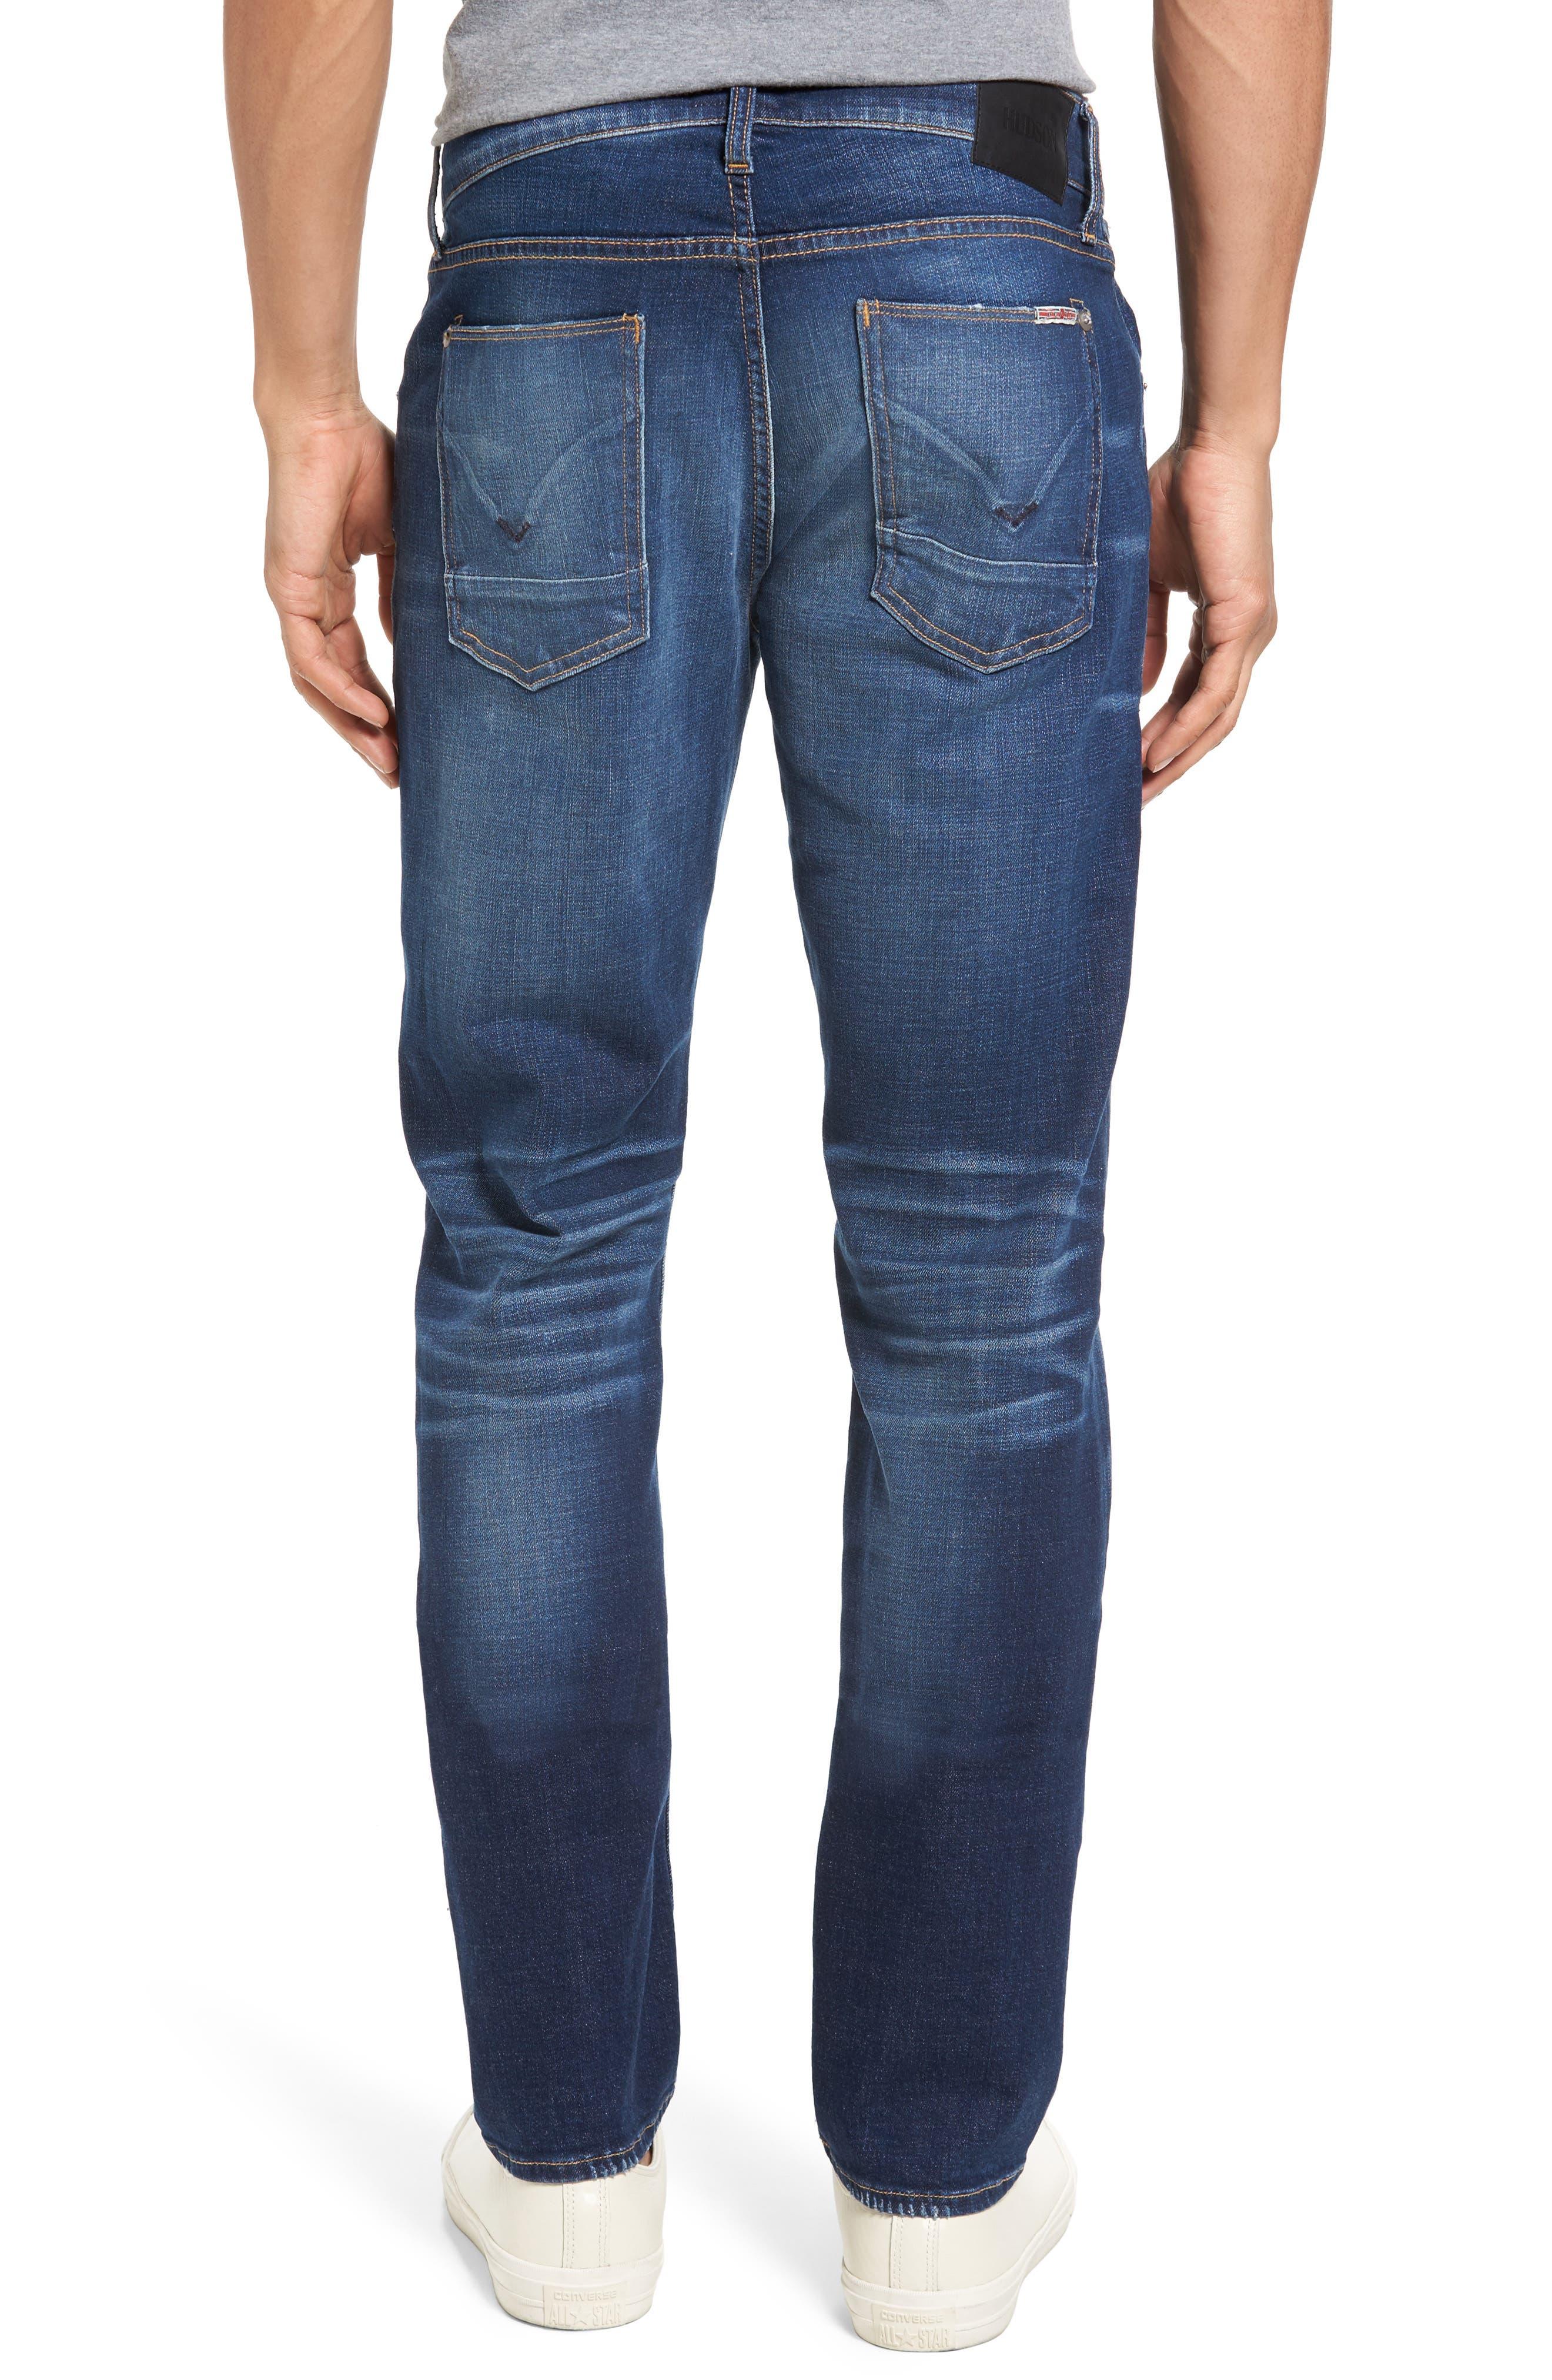 Blake Slim Fit Jeans,                             Alternate thumbnail 2, color,                             426